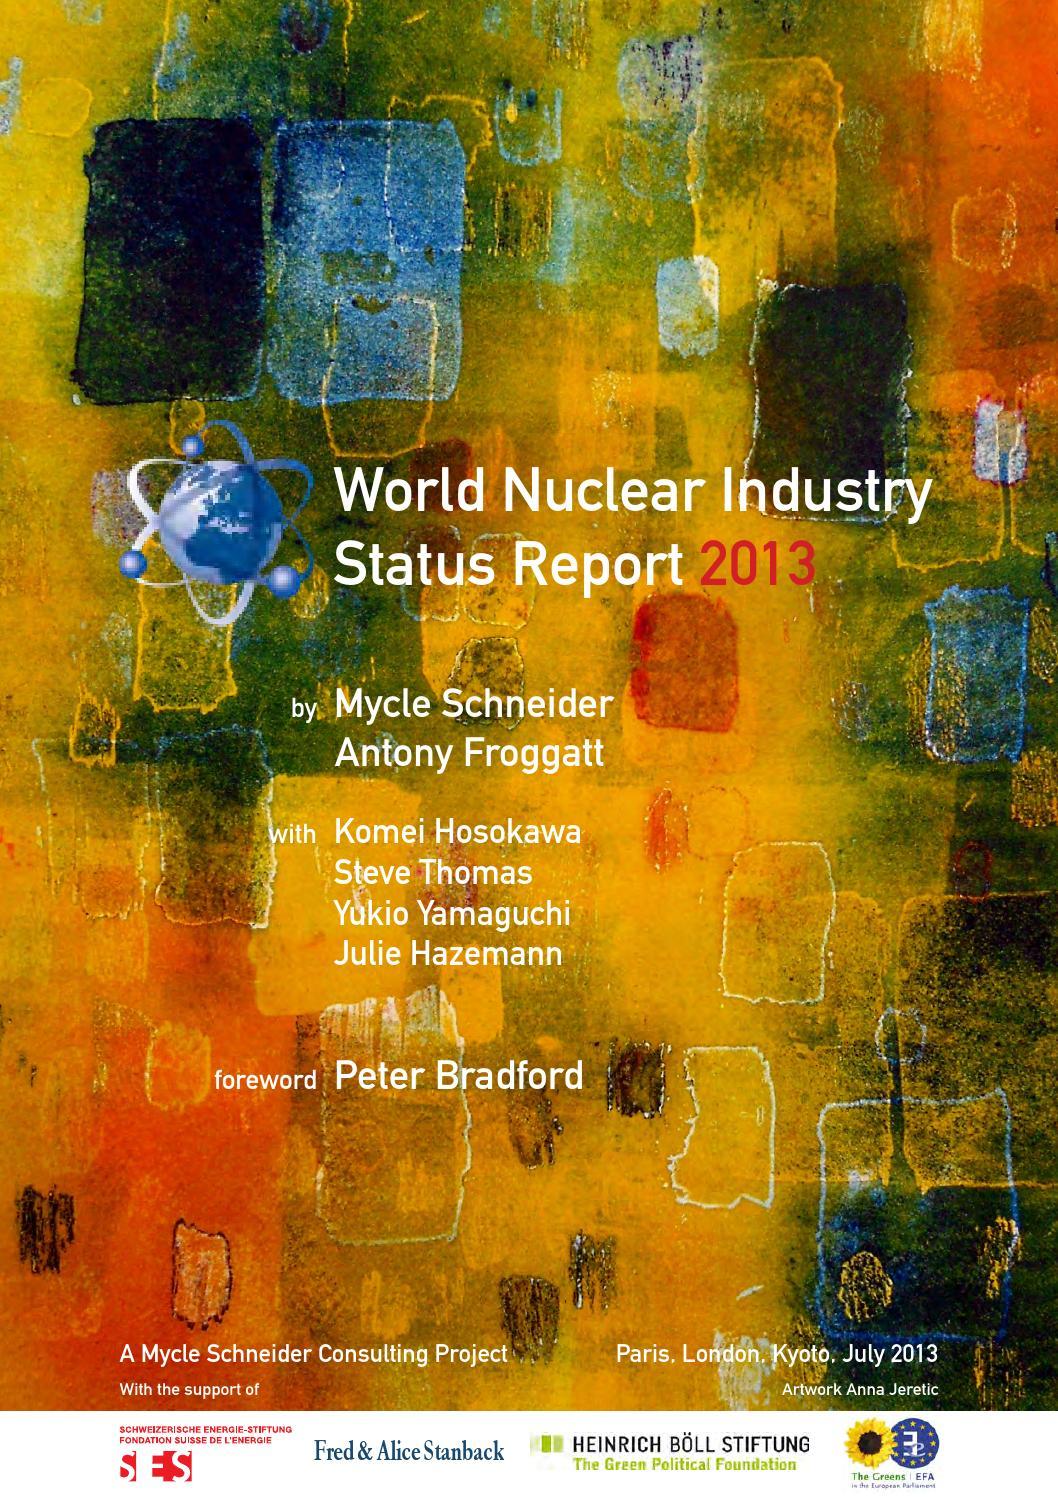 World Nuclear Industry Status Report 2013 by Fundacja im  Heinricha